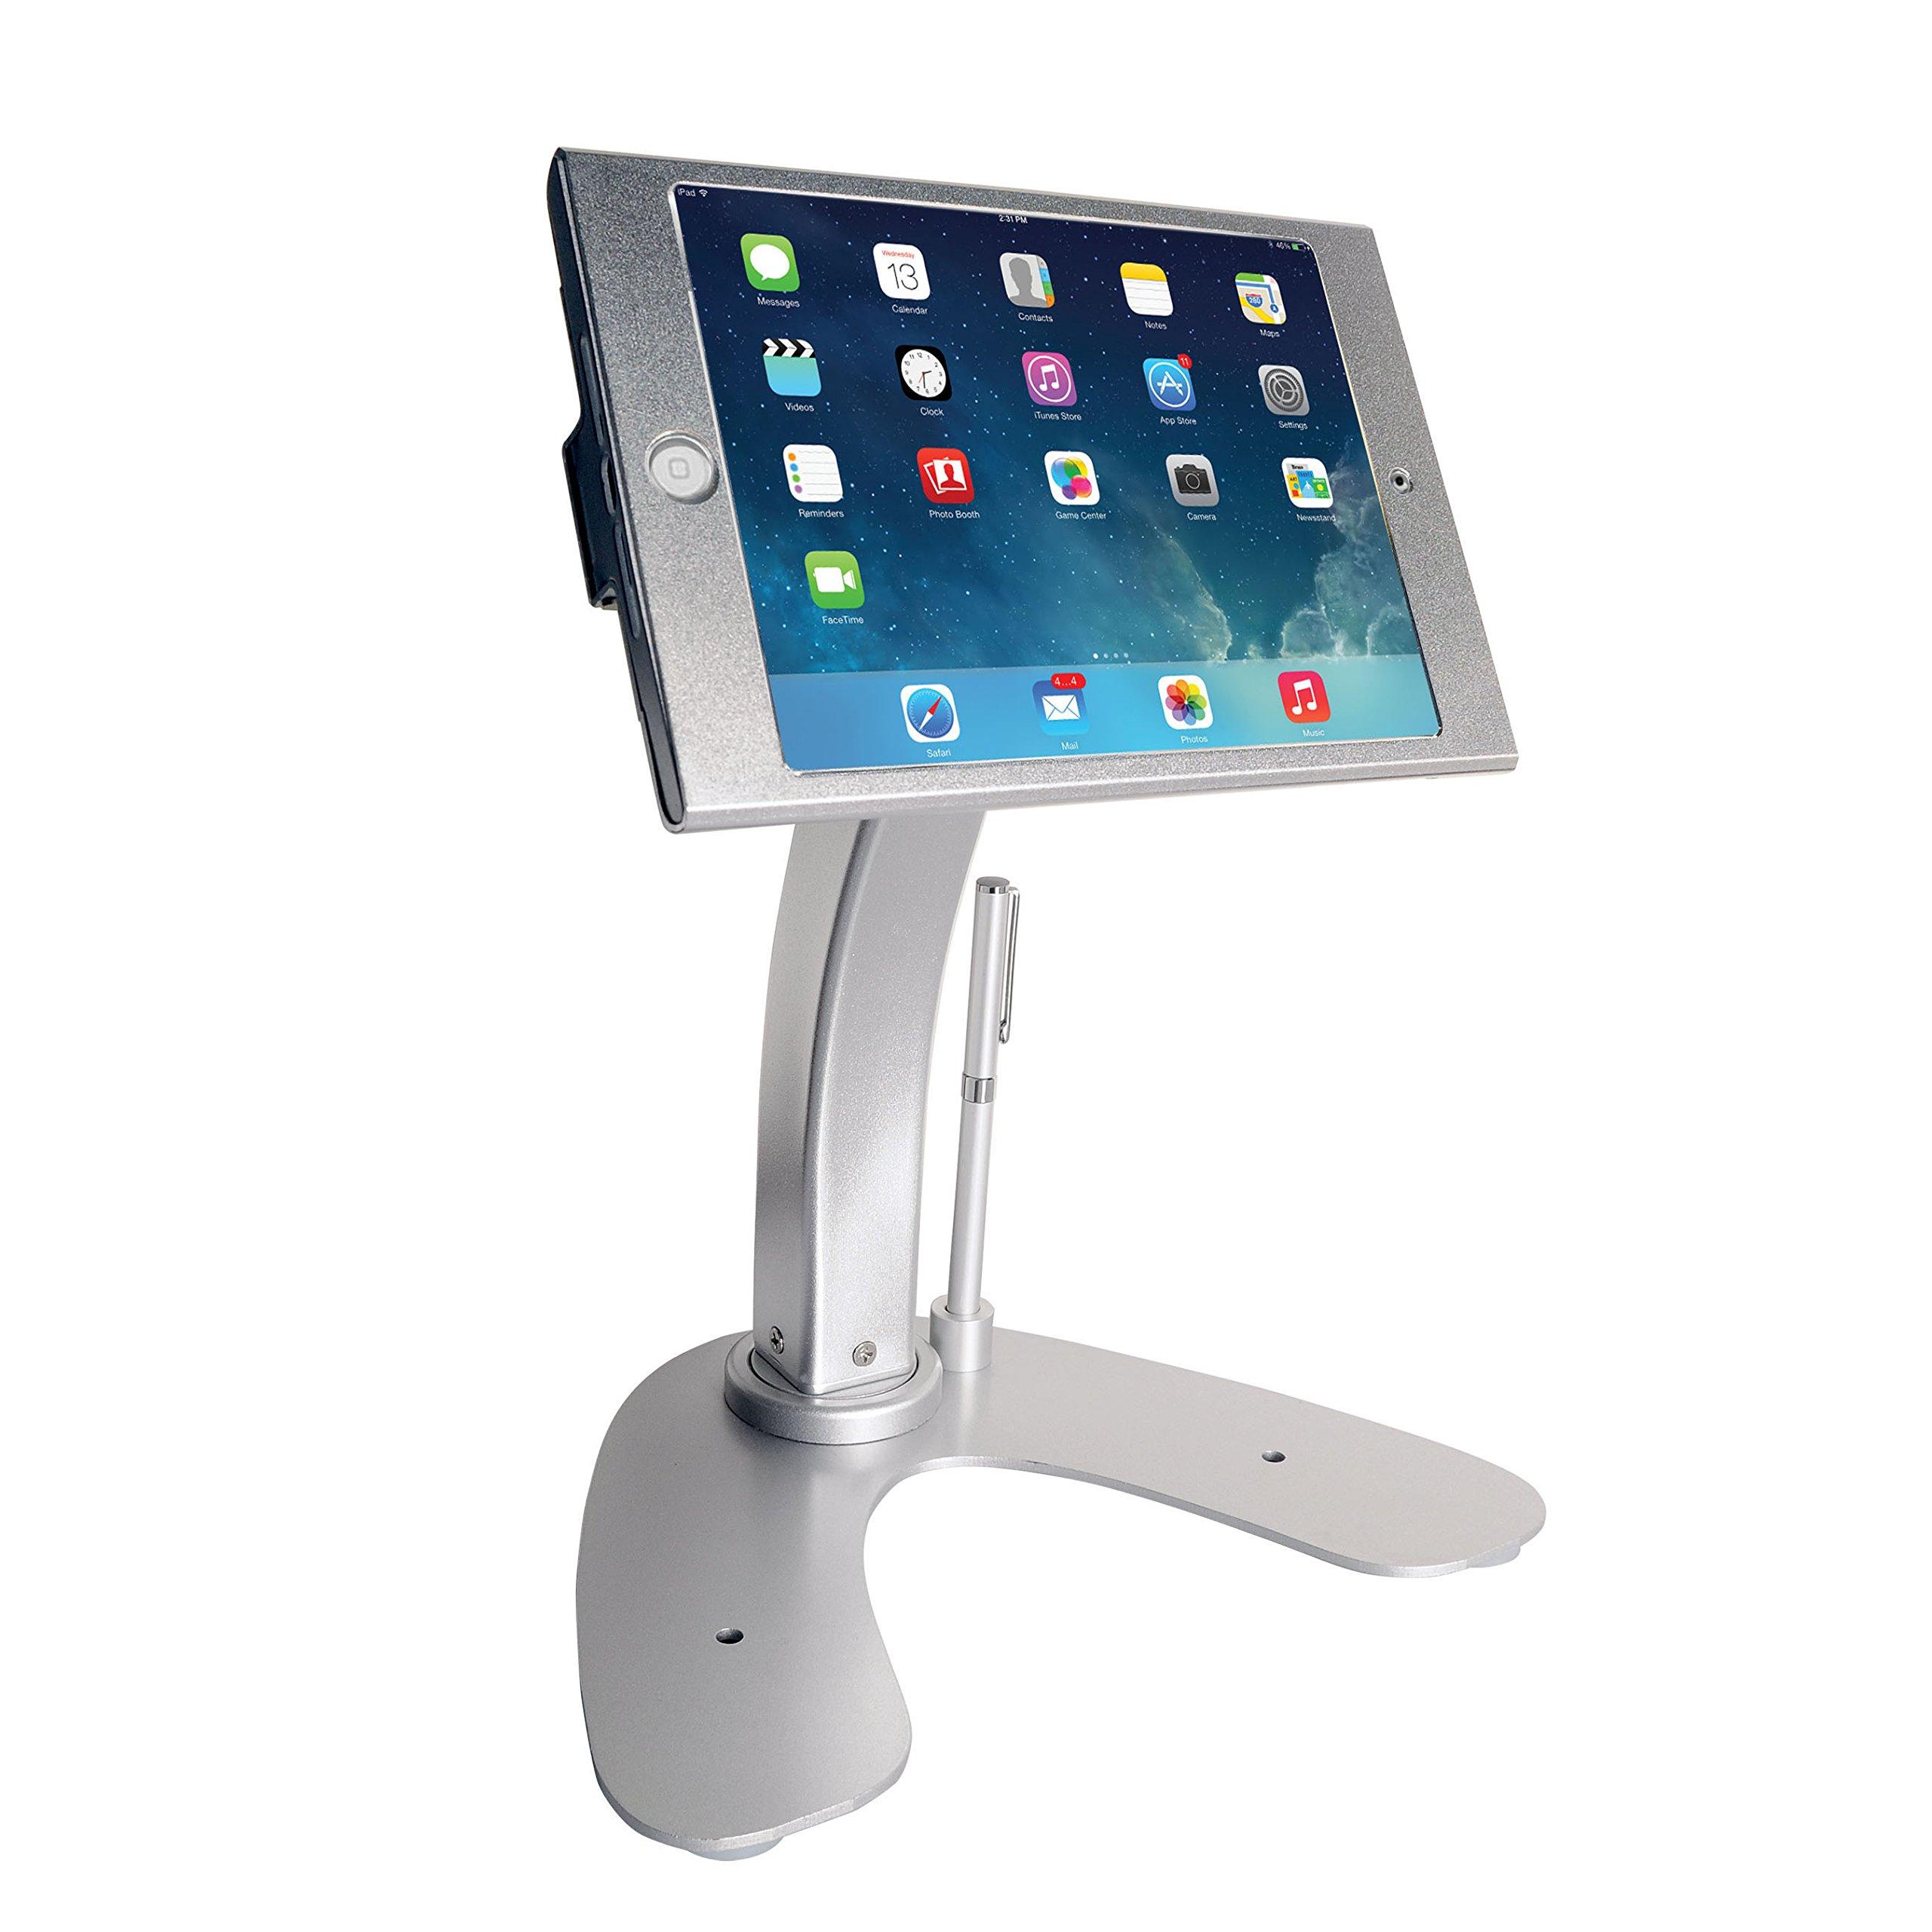 CTA Digital Anti-Theft Security Kiosk & POS Stand for iPad mini 1 / 2 / 3 / 4 (PAD-ASKM) by CTA Digital